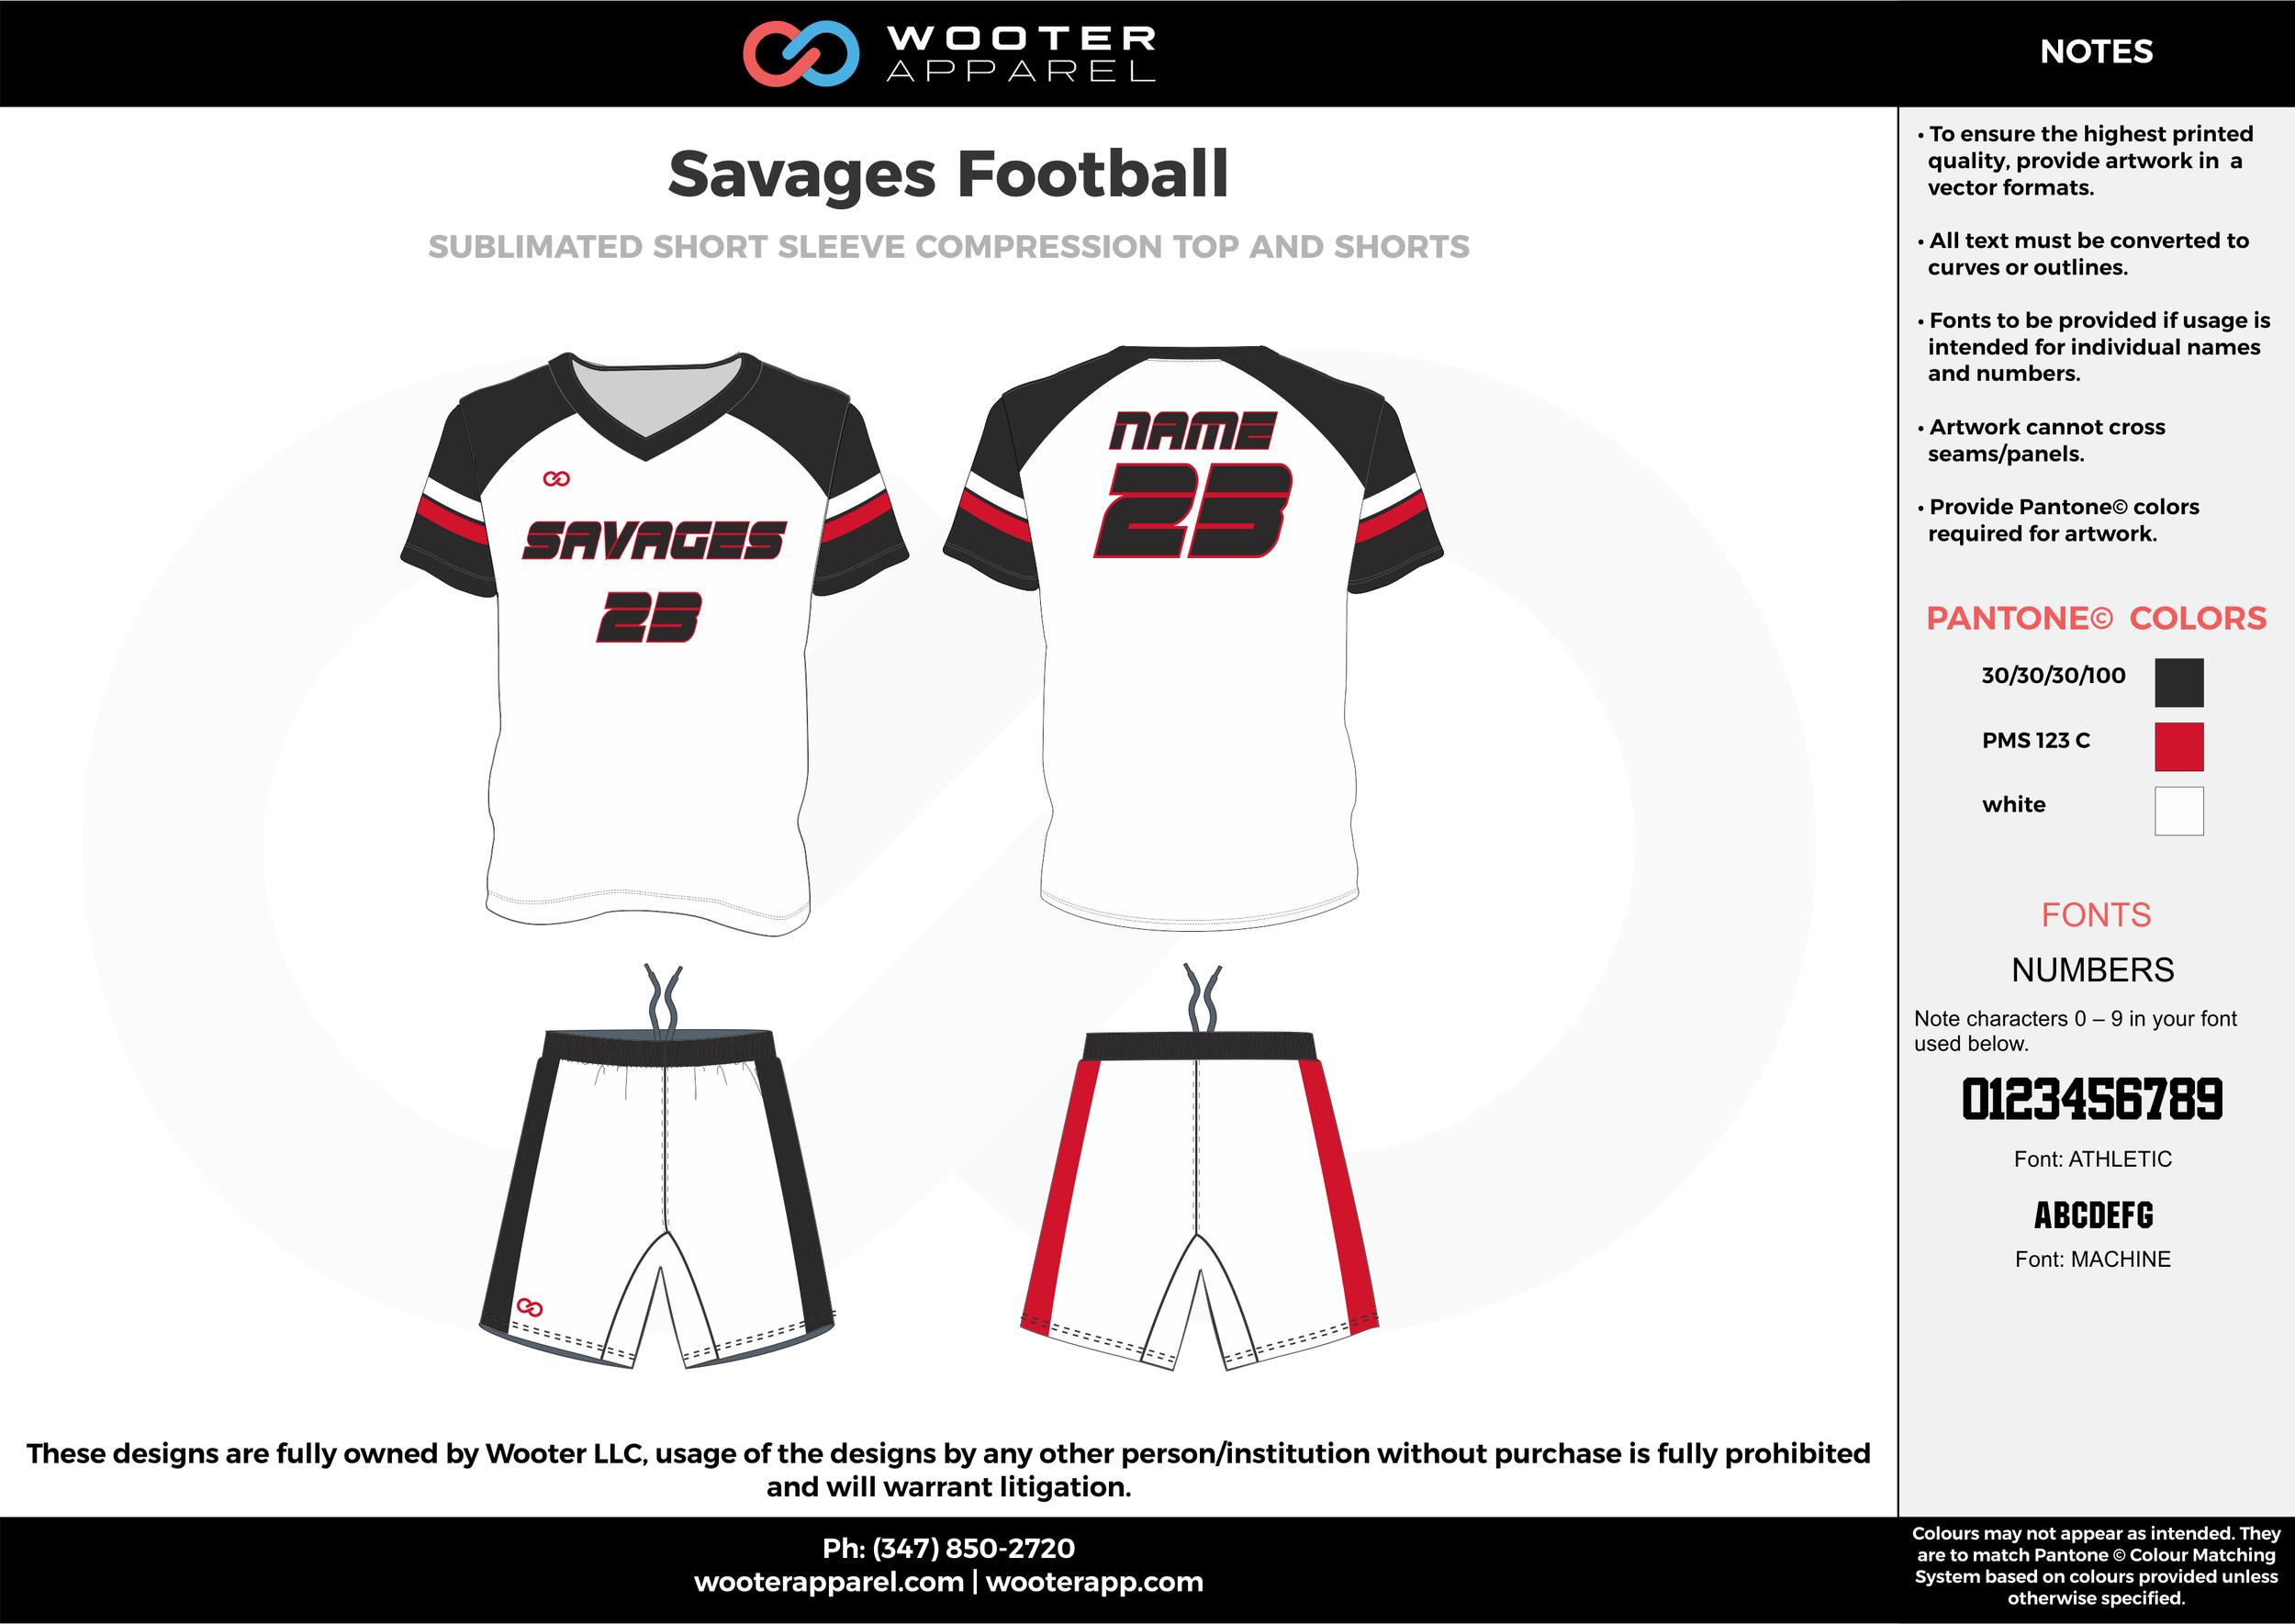 Savages Football white red black football uniforms jerseys shorts